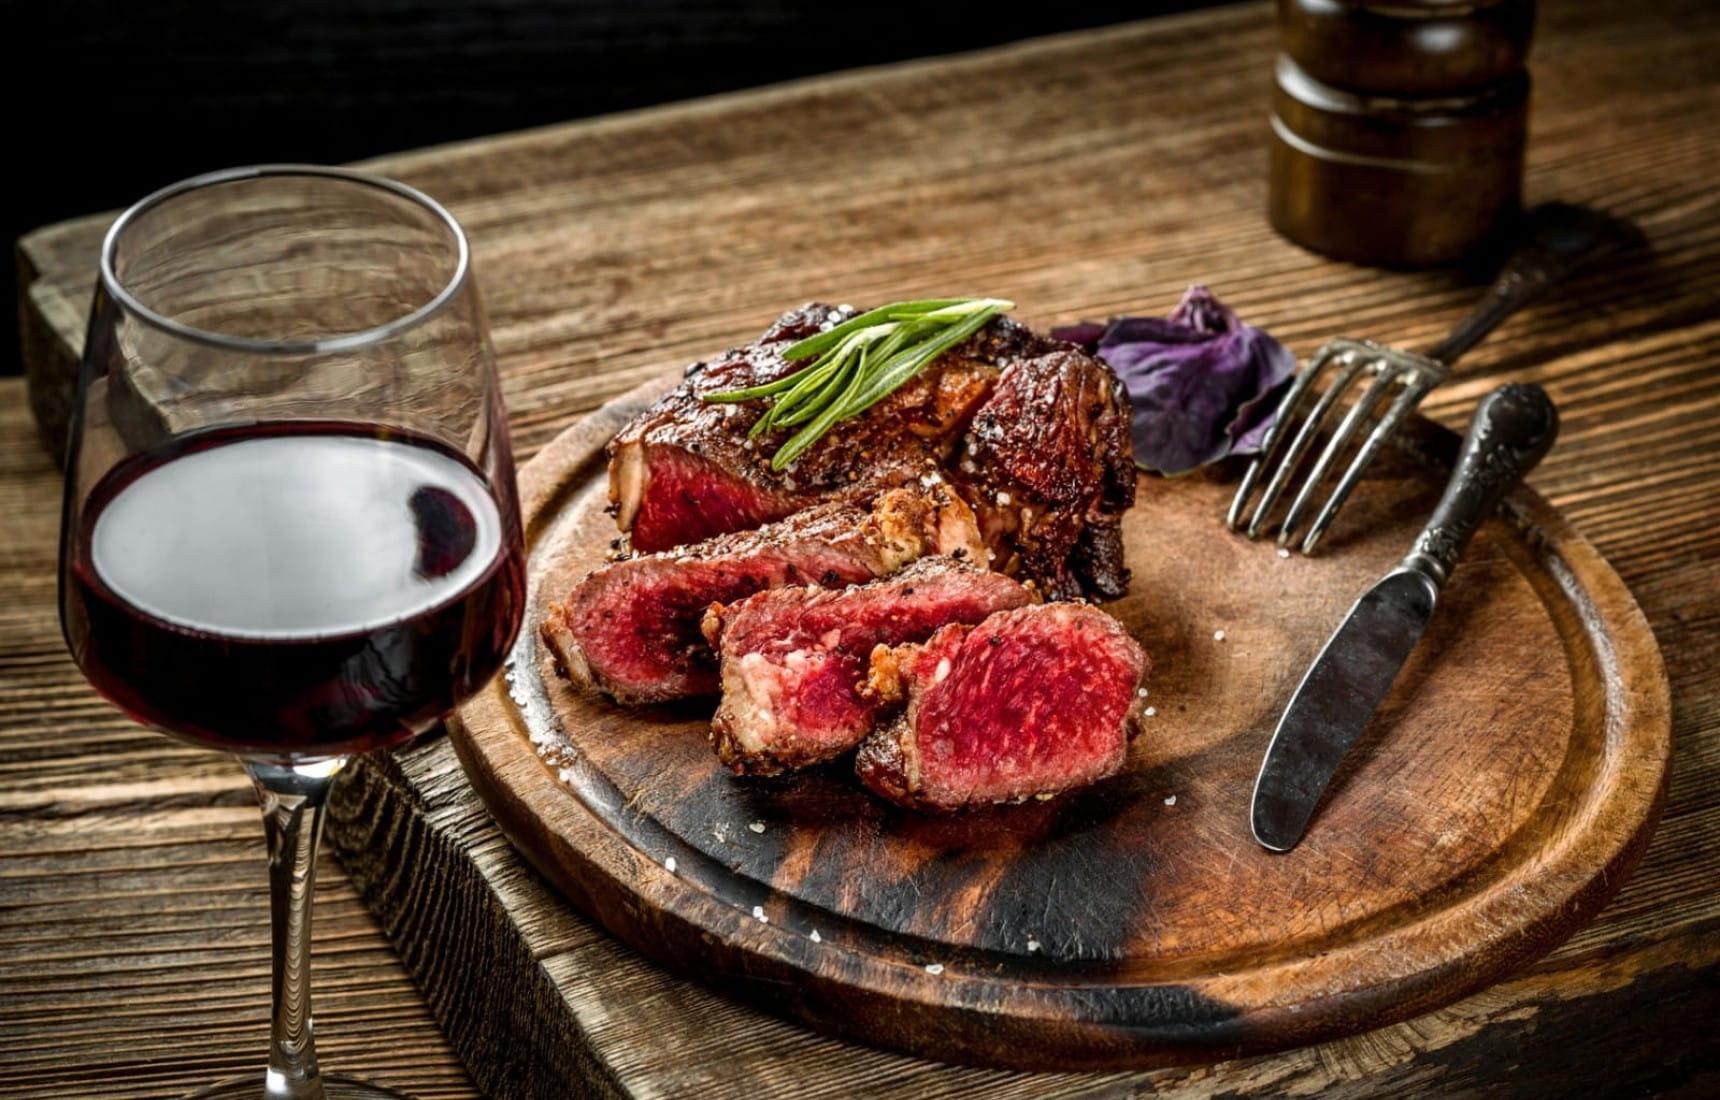 rare-steak-with-a-glass-of-cabernet-sauvignon@2x